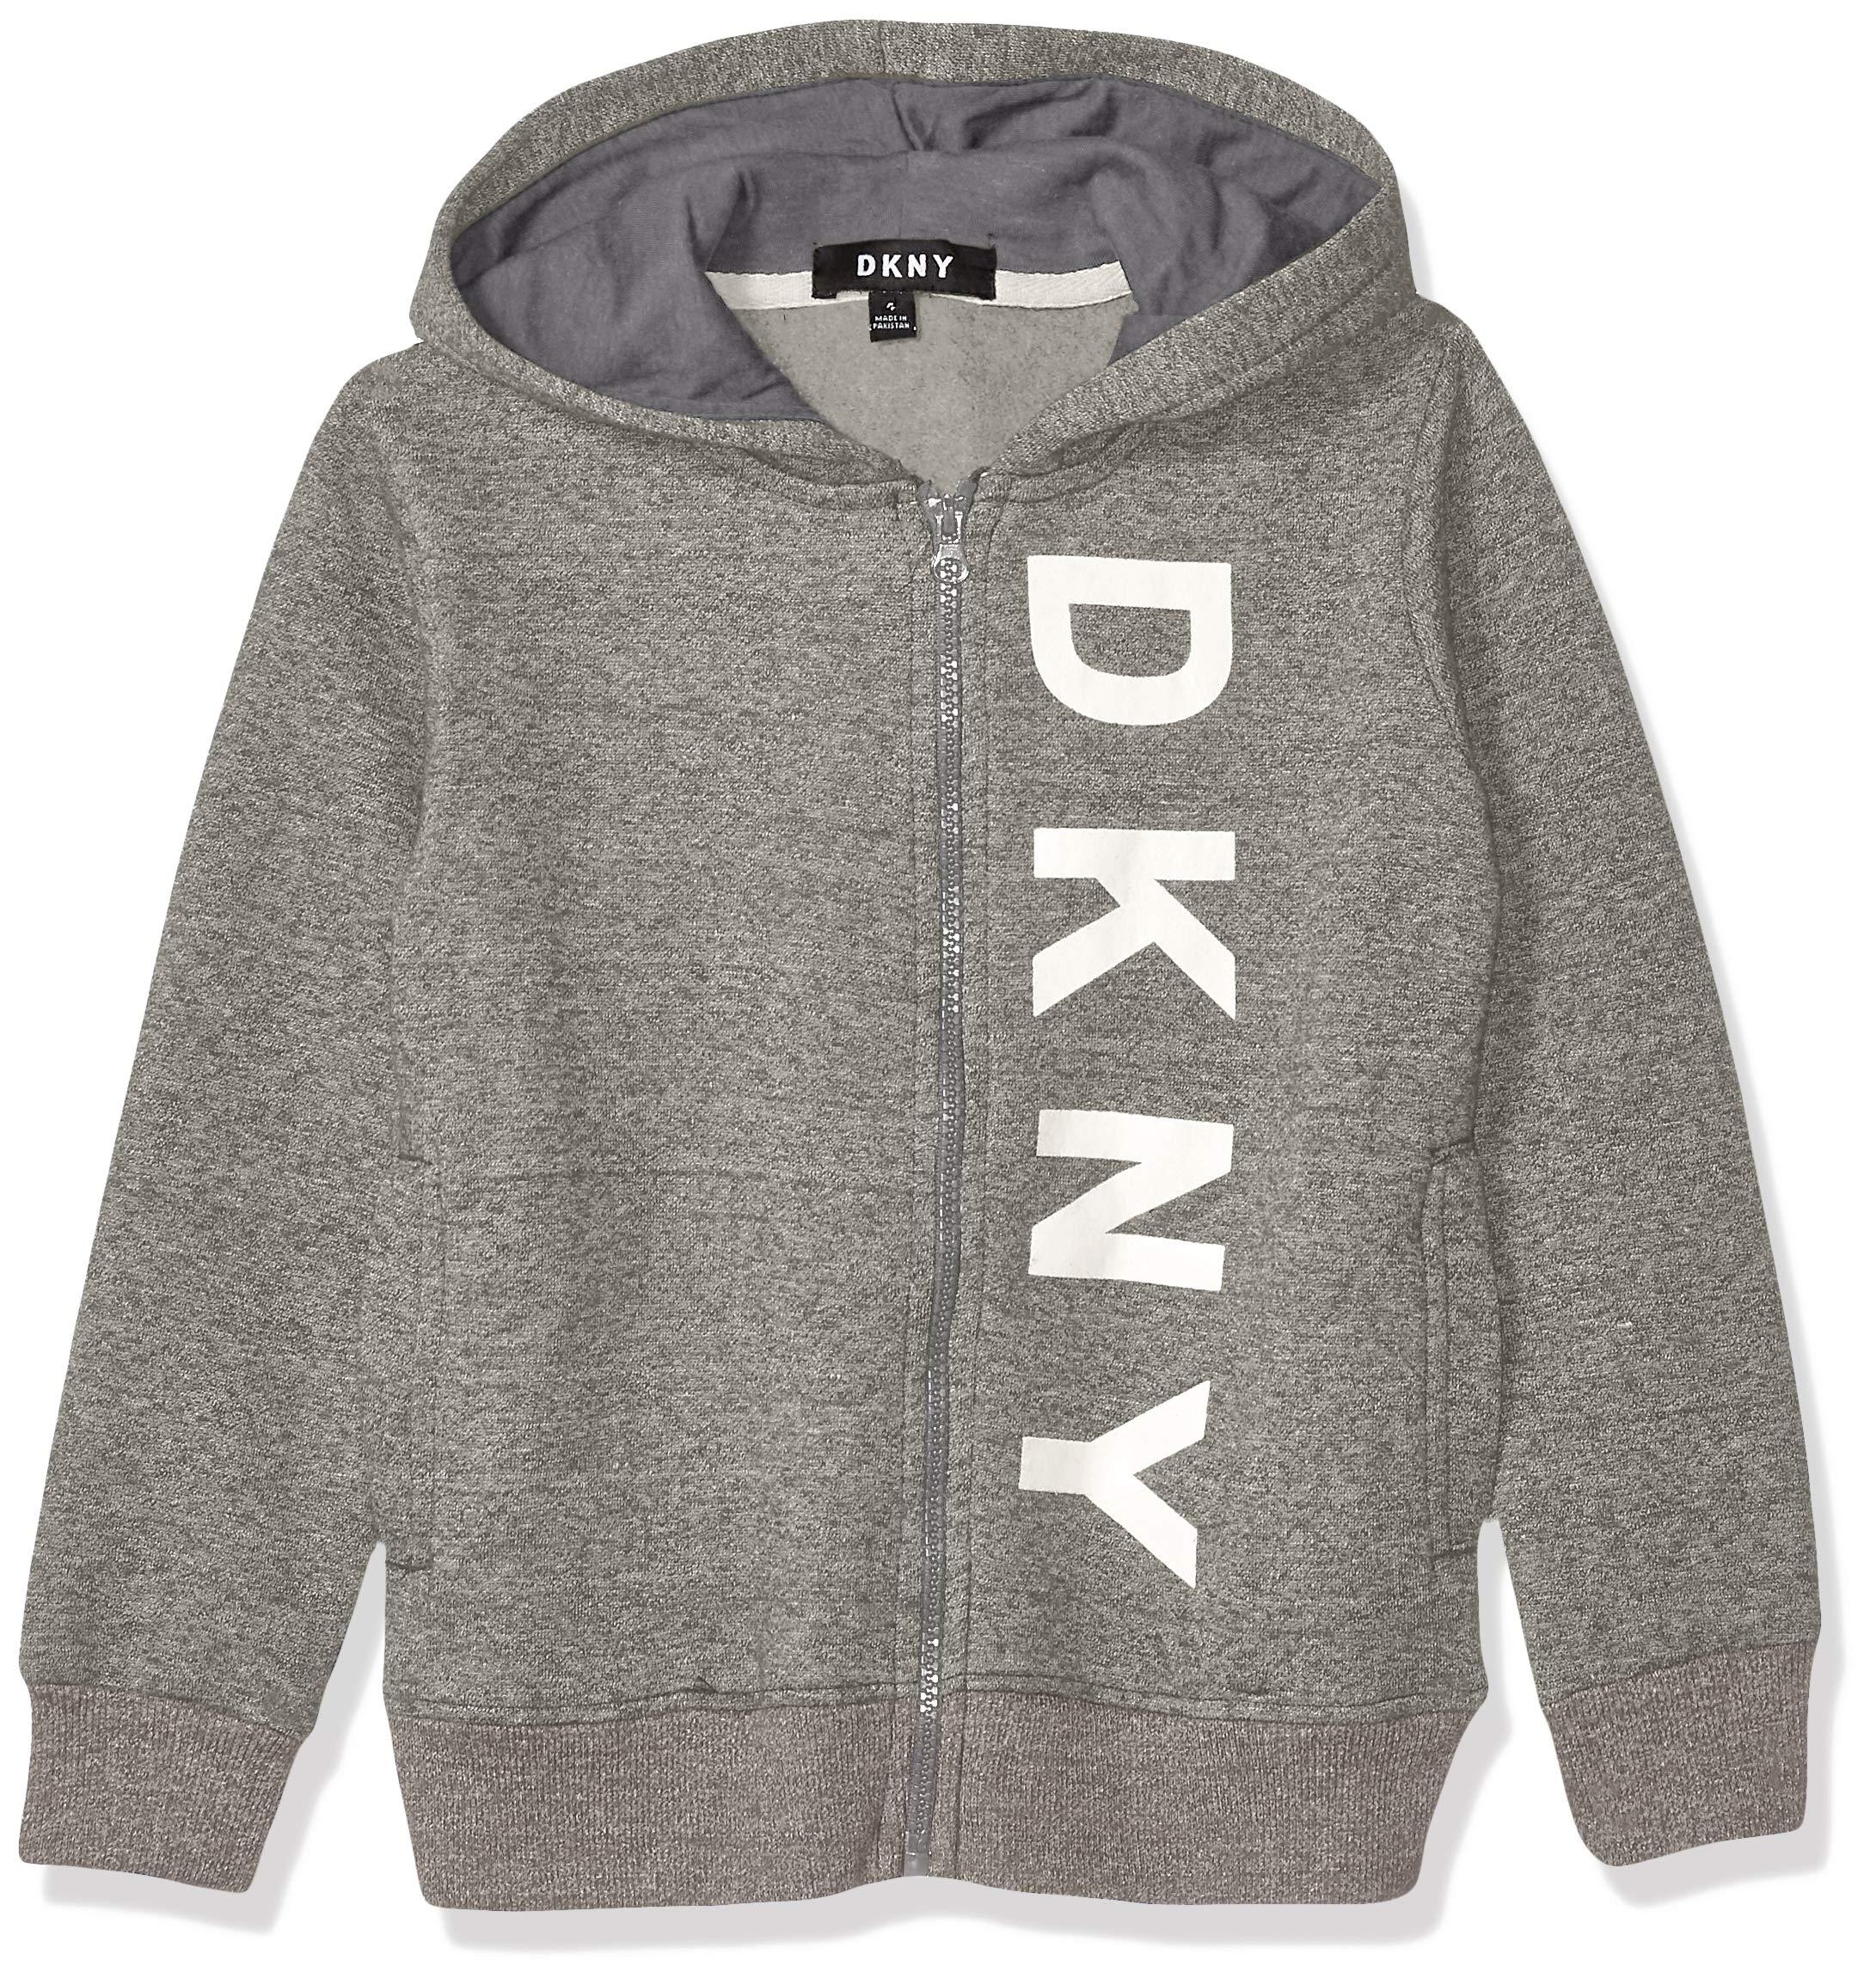 DKNY Boys' Fleece Zip Hoodie